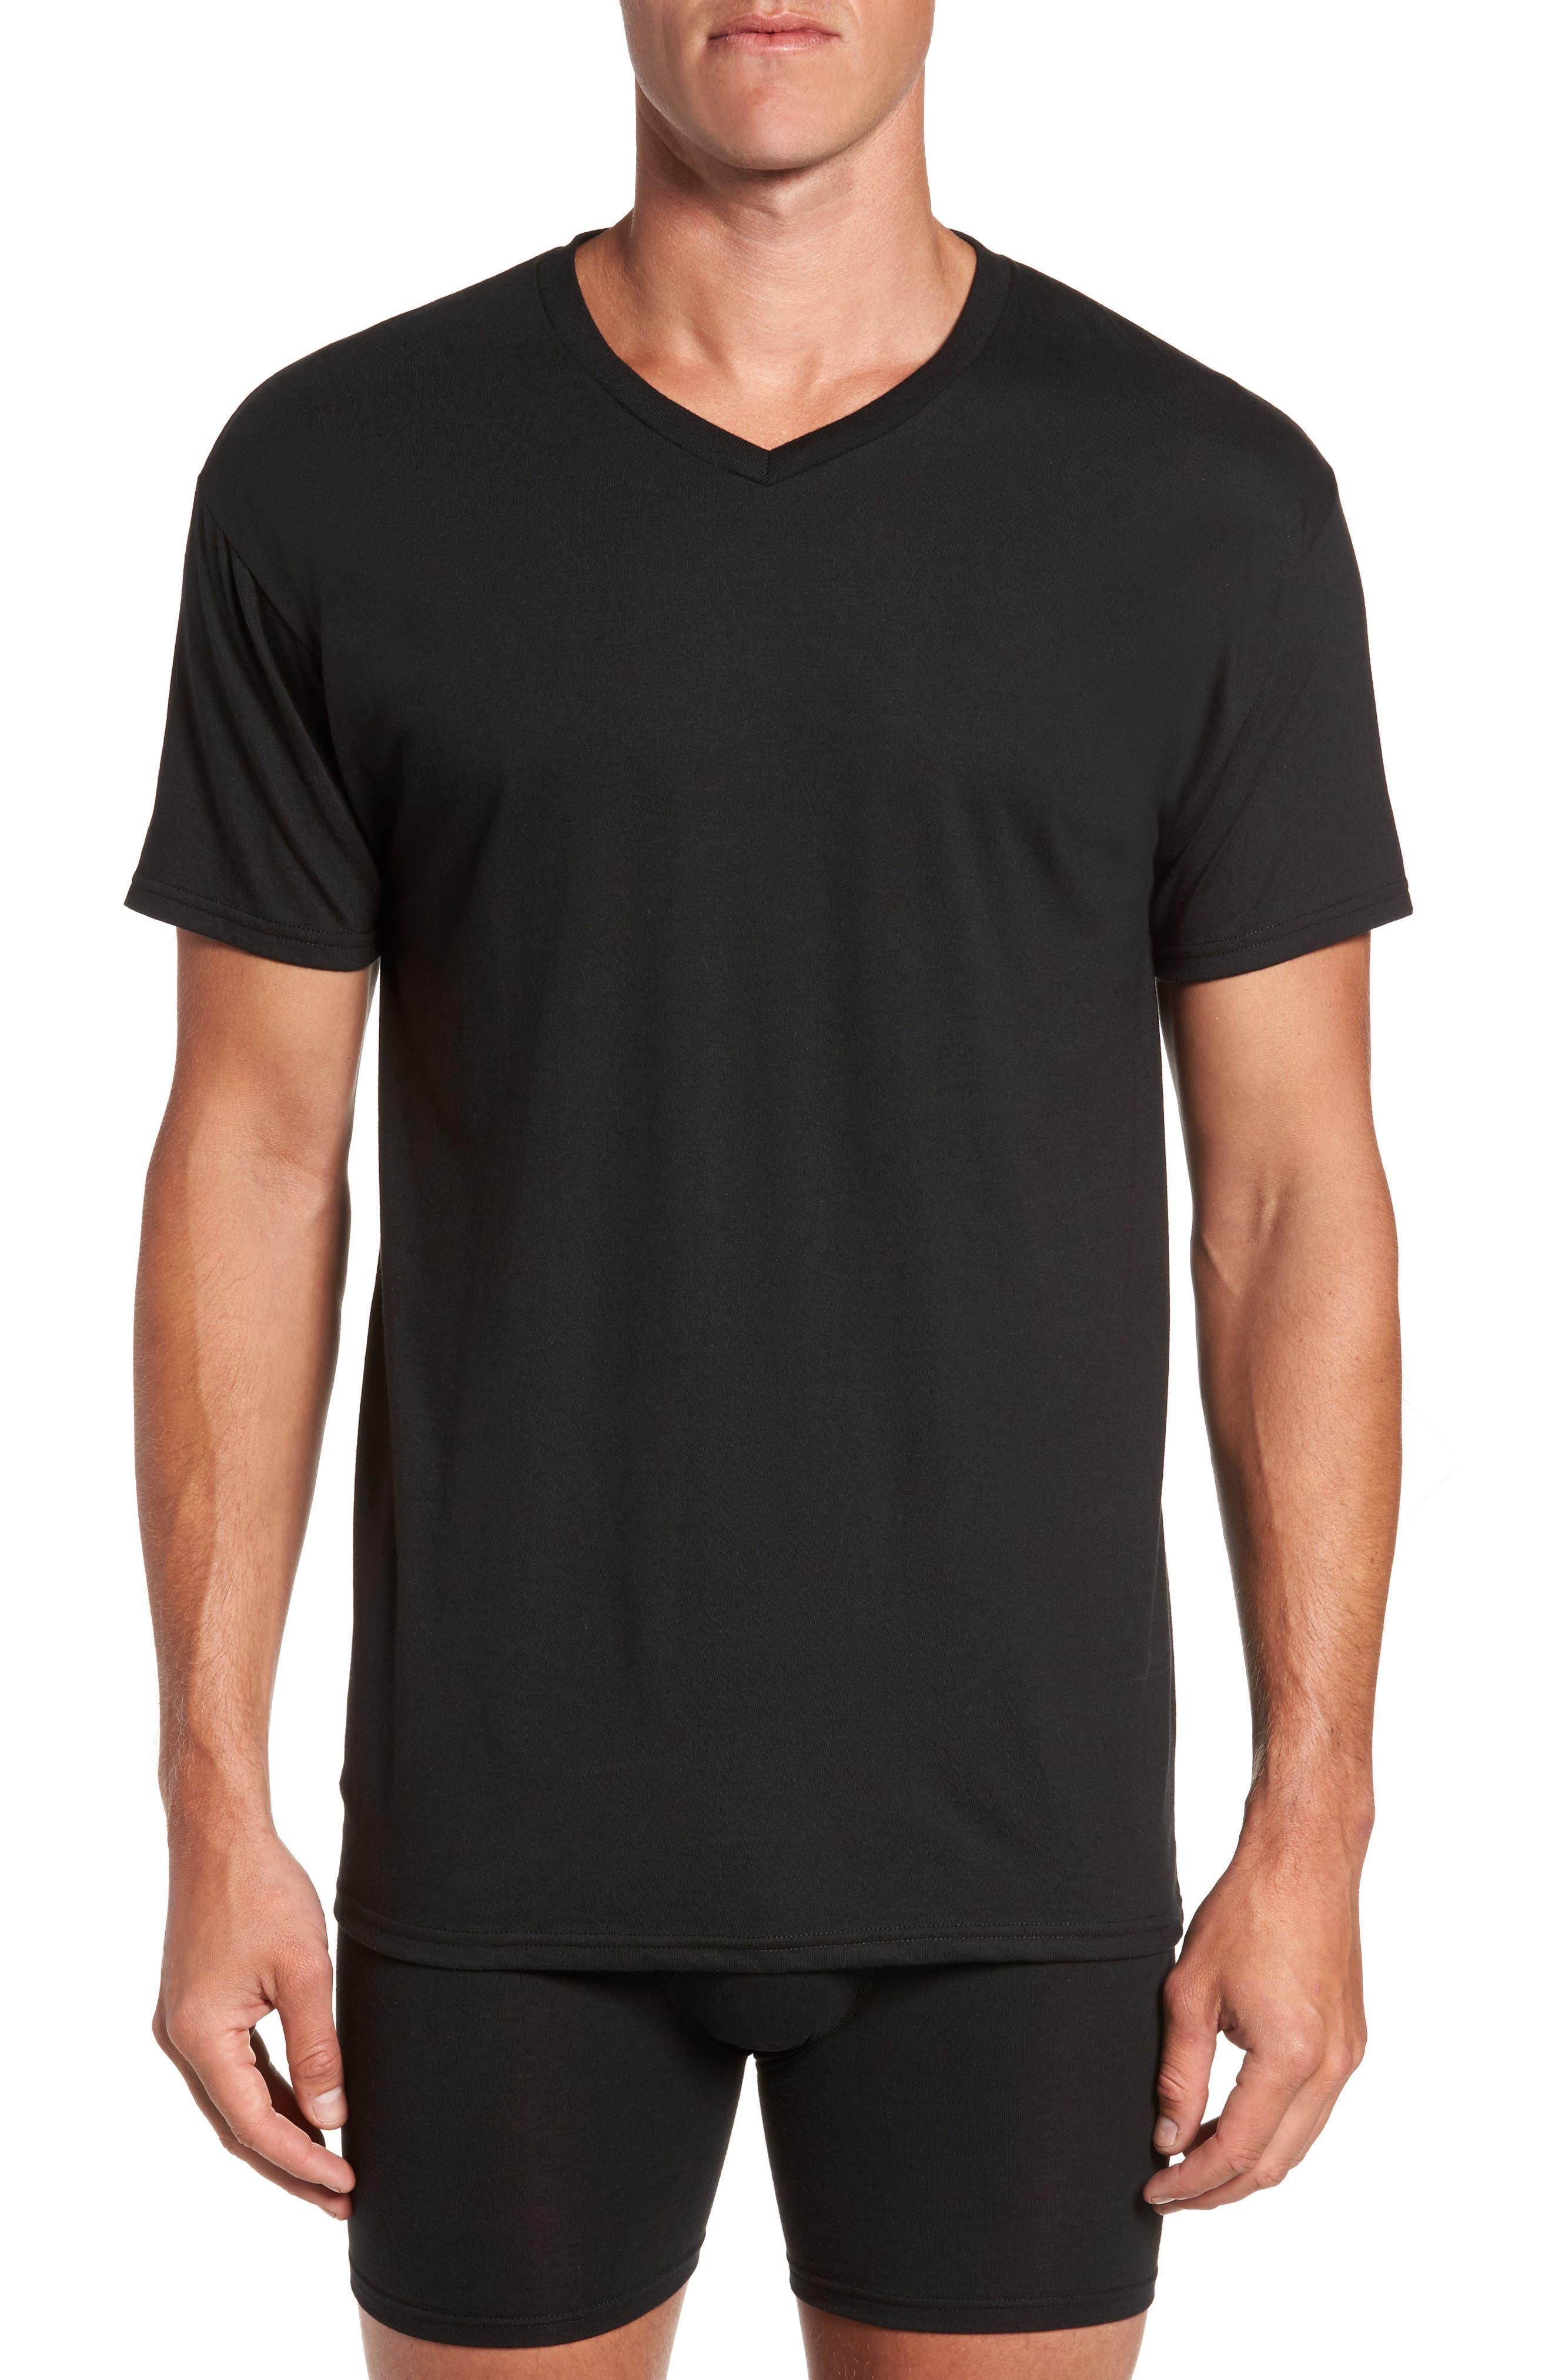 Alternate Image 2  - Hanes Luxury Essentials 3-Pack V-Neck T-Shirt